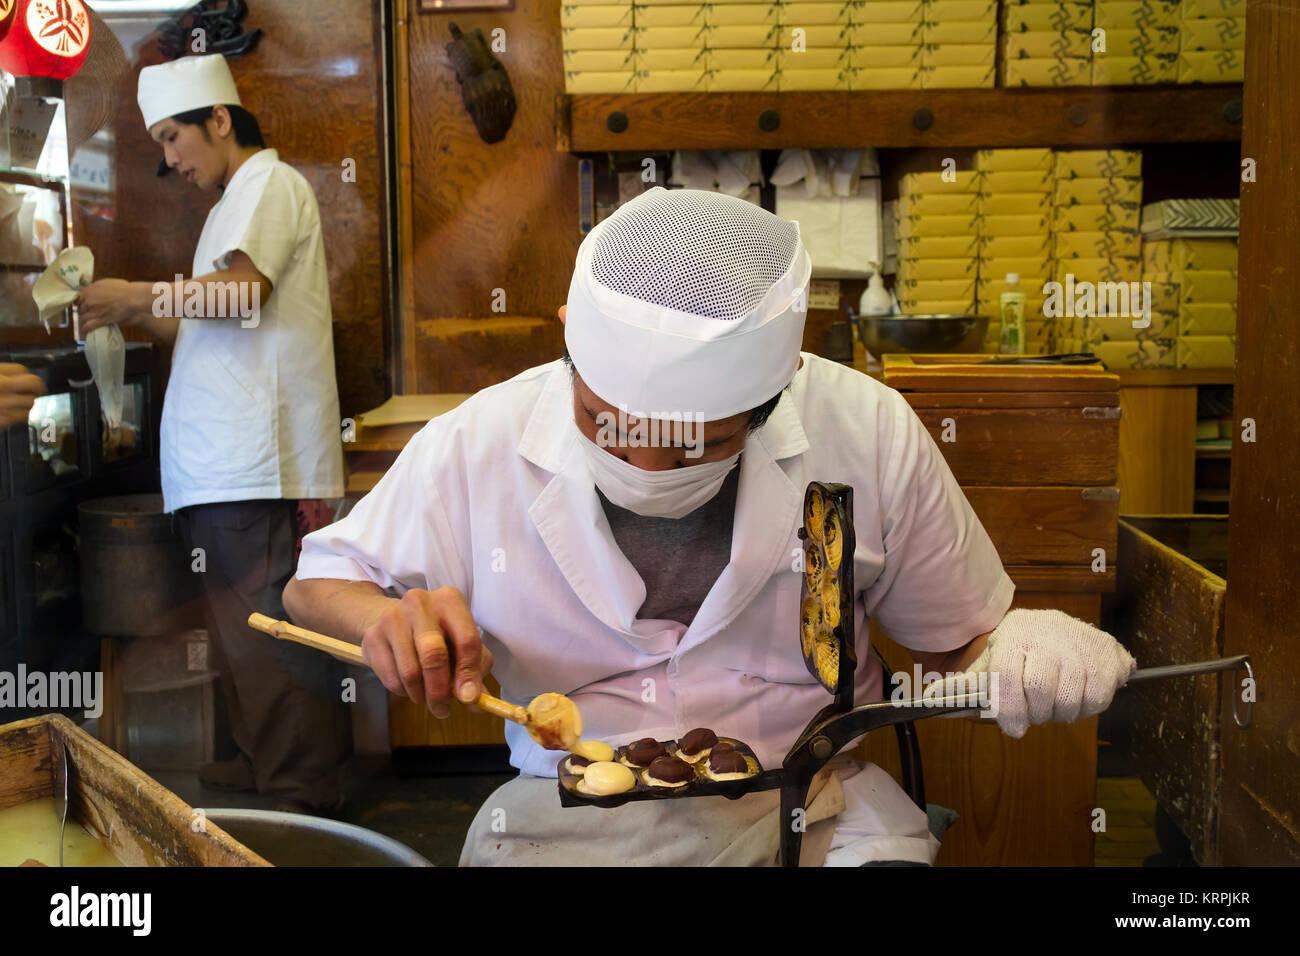 Tokyo - Japan, June 16, 2017; Preparing traditional Japanese handmade cookies in a small biscuit bakery in Asakusa, - Stock Image